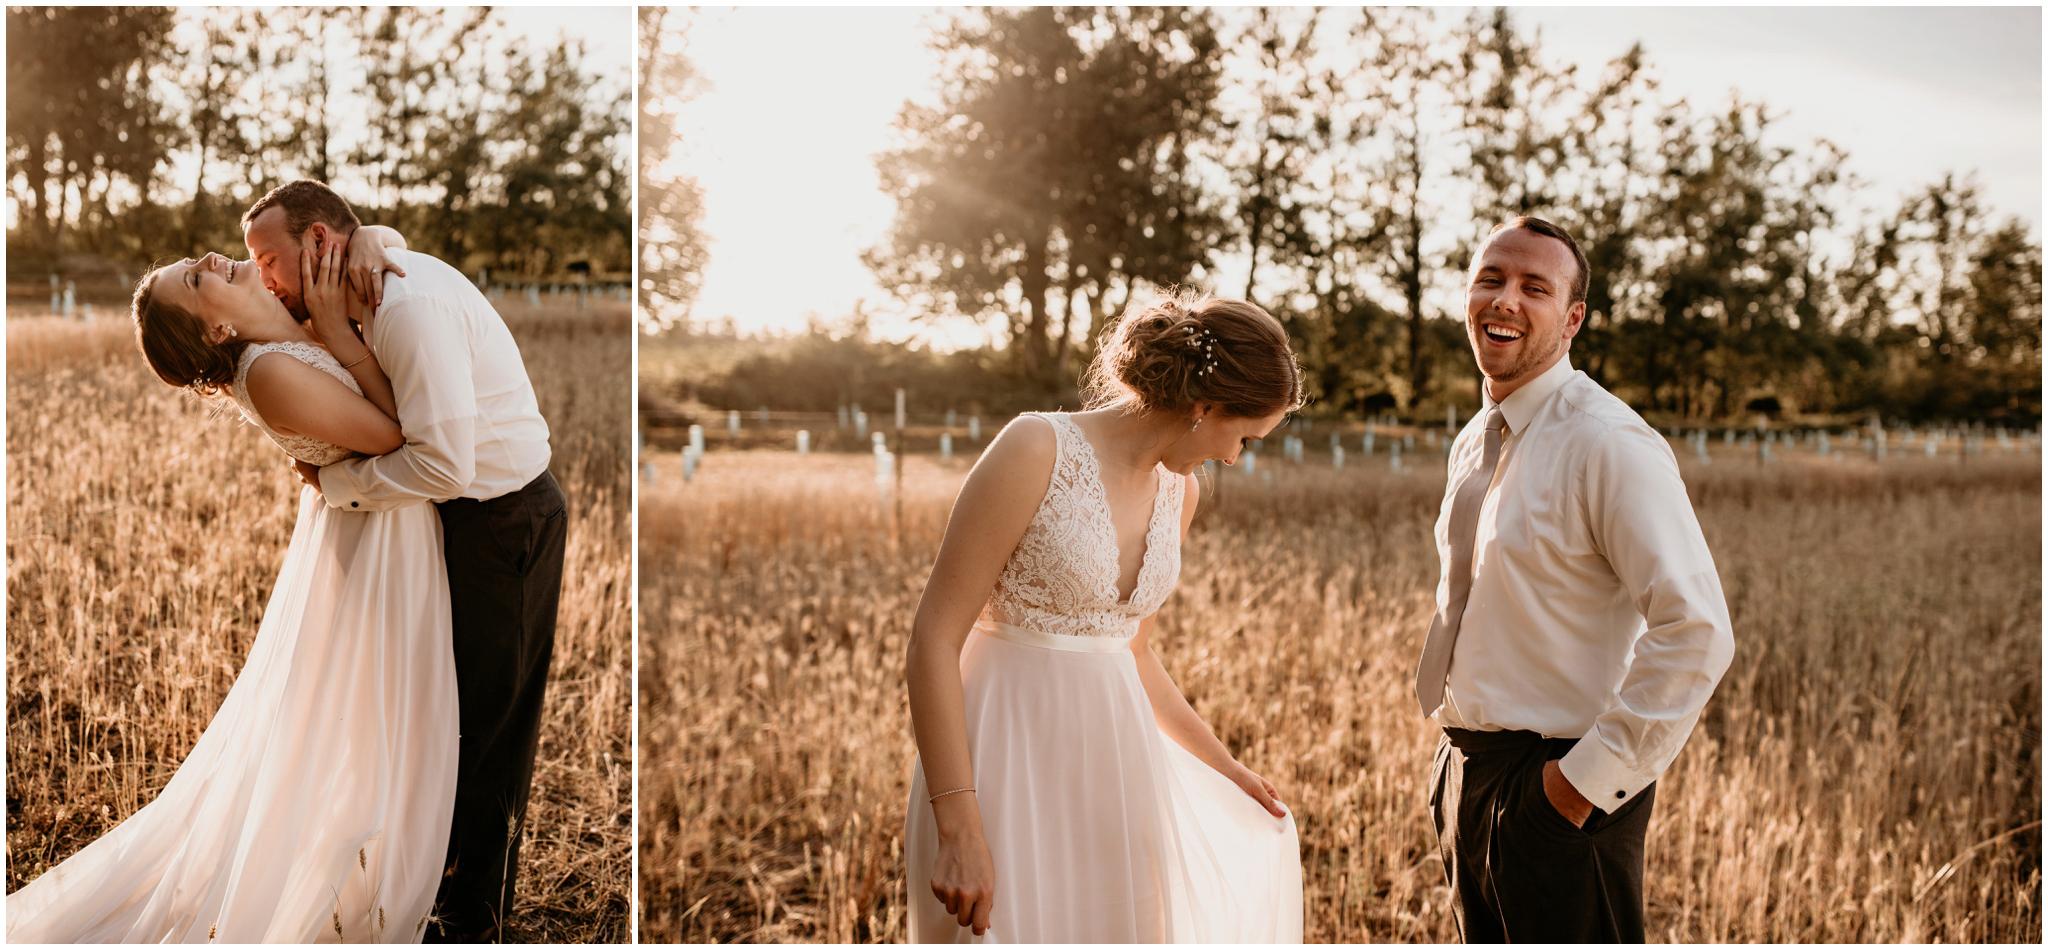 erin-and-tyler-evergreen-gardens-bellingham-wedding-photographer-115.jpg